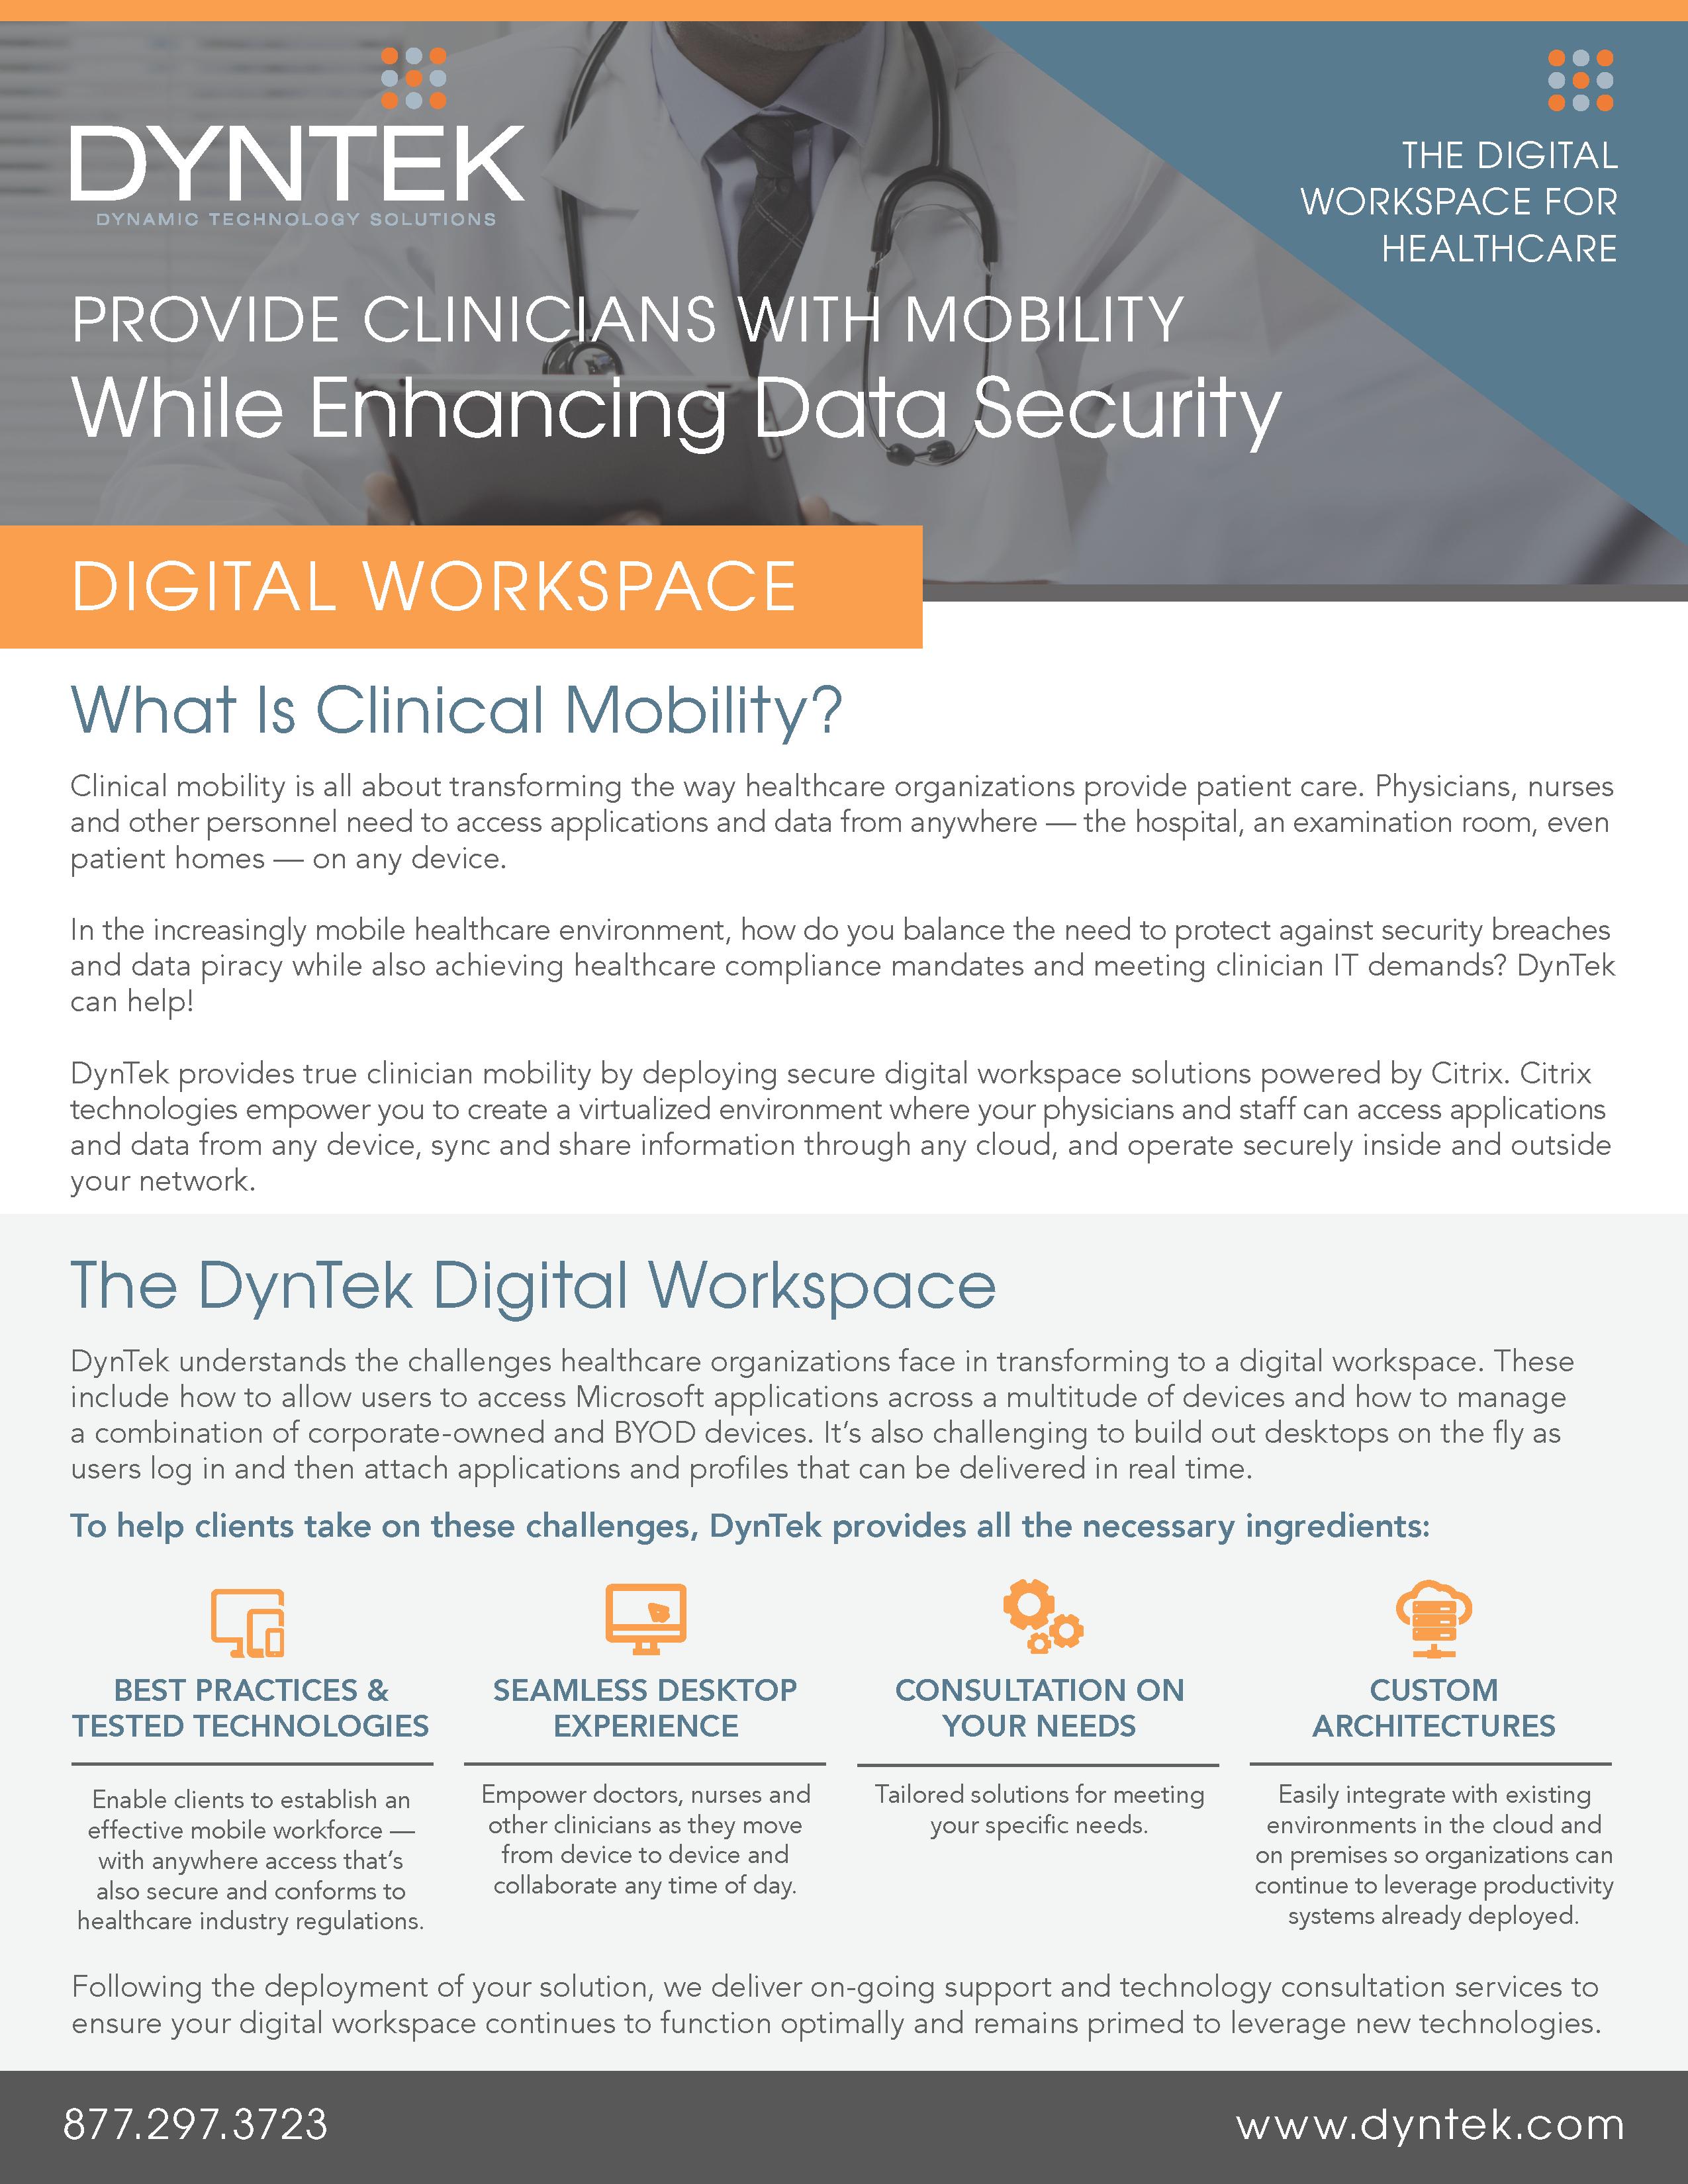 DynTek Digital Workspace-Healthcare 2017_Page_1